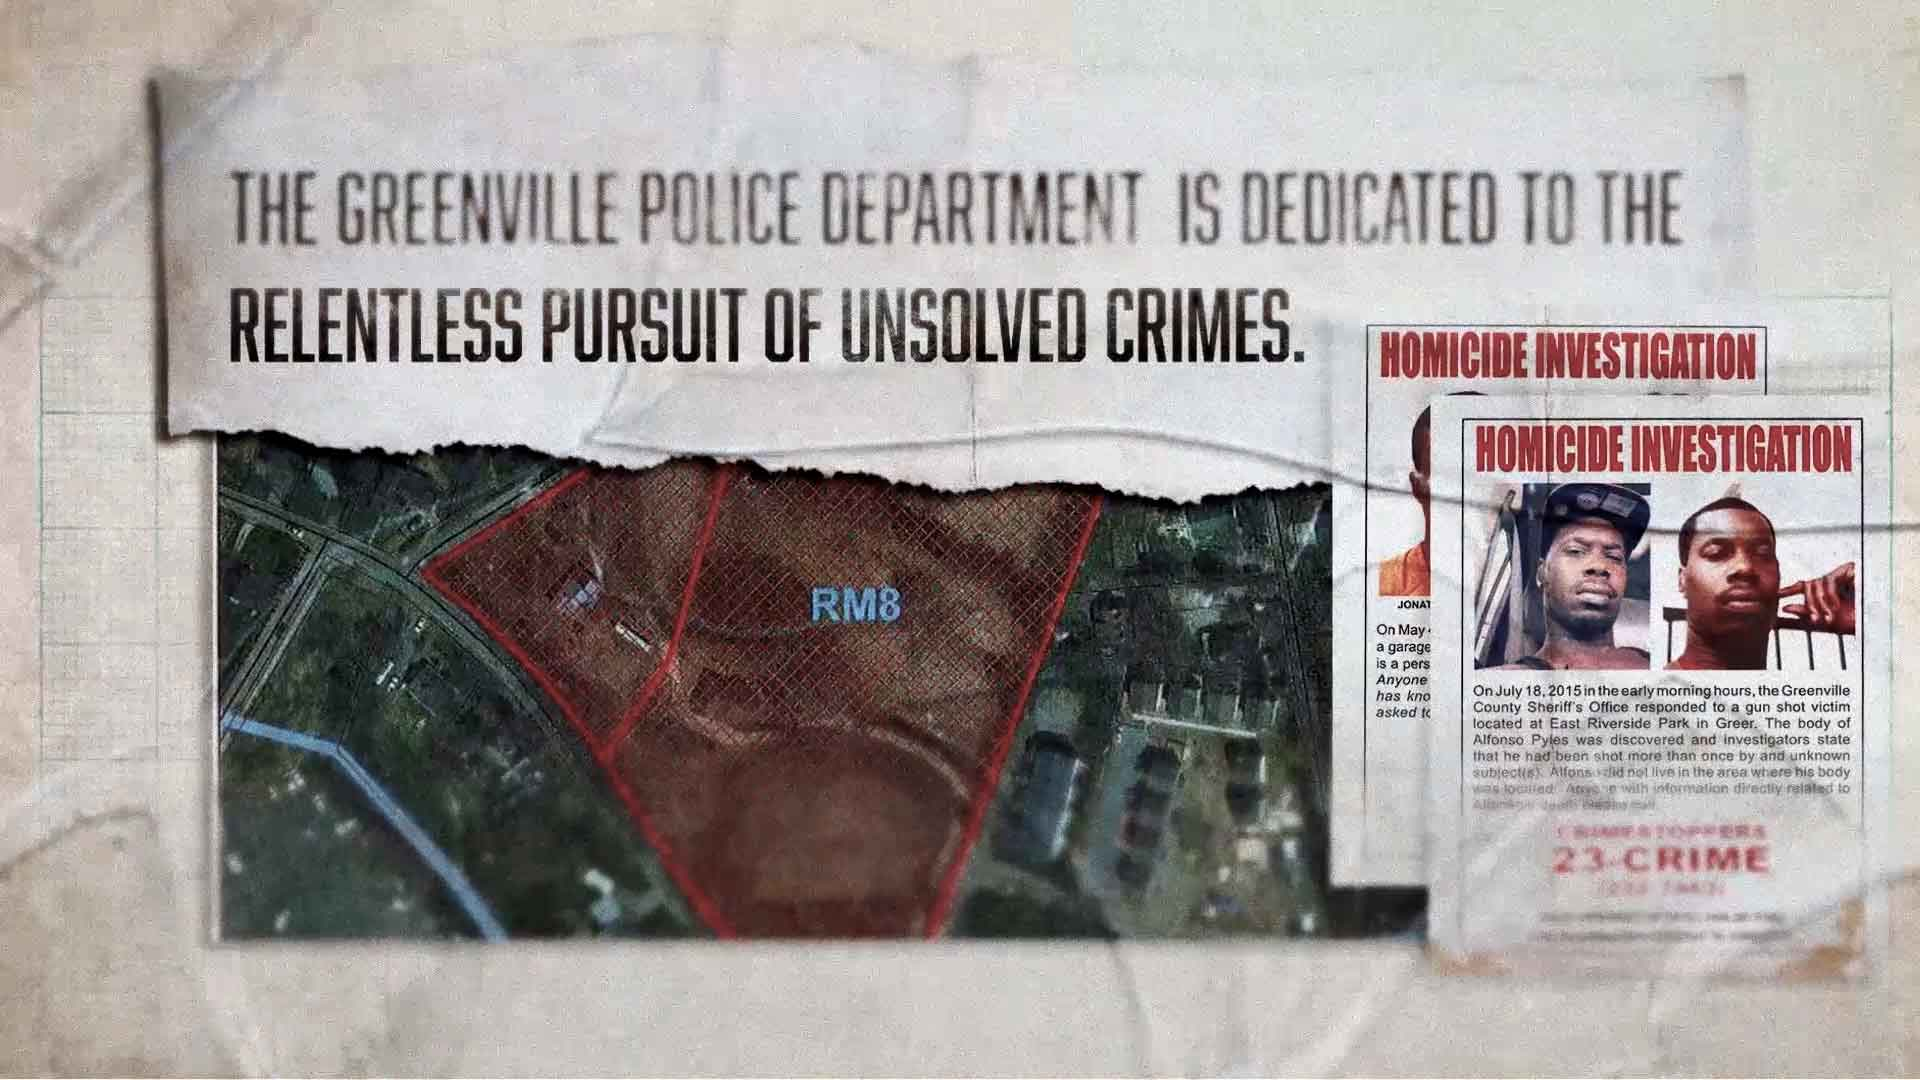 Greenville-police-8